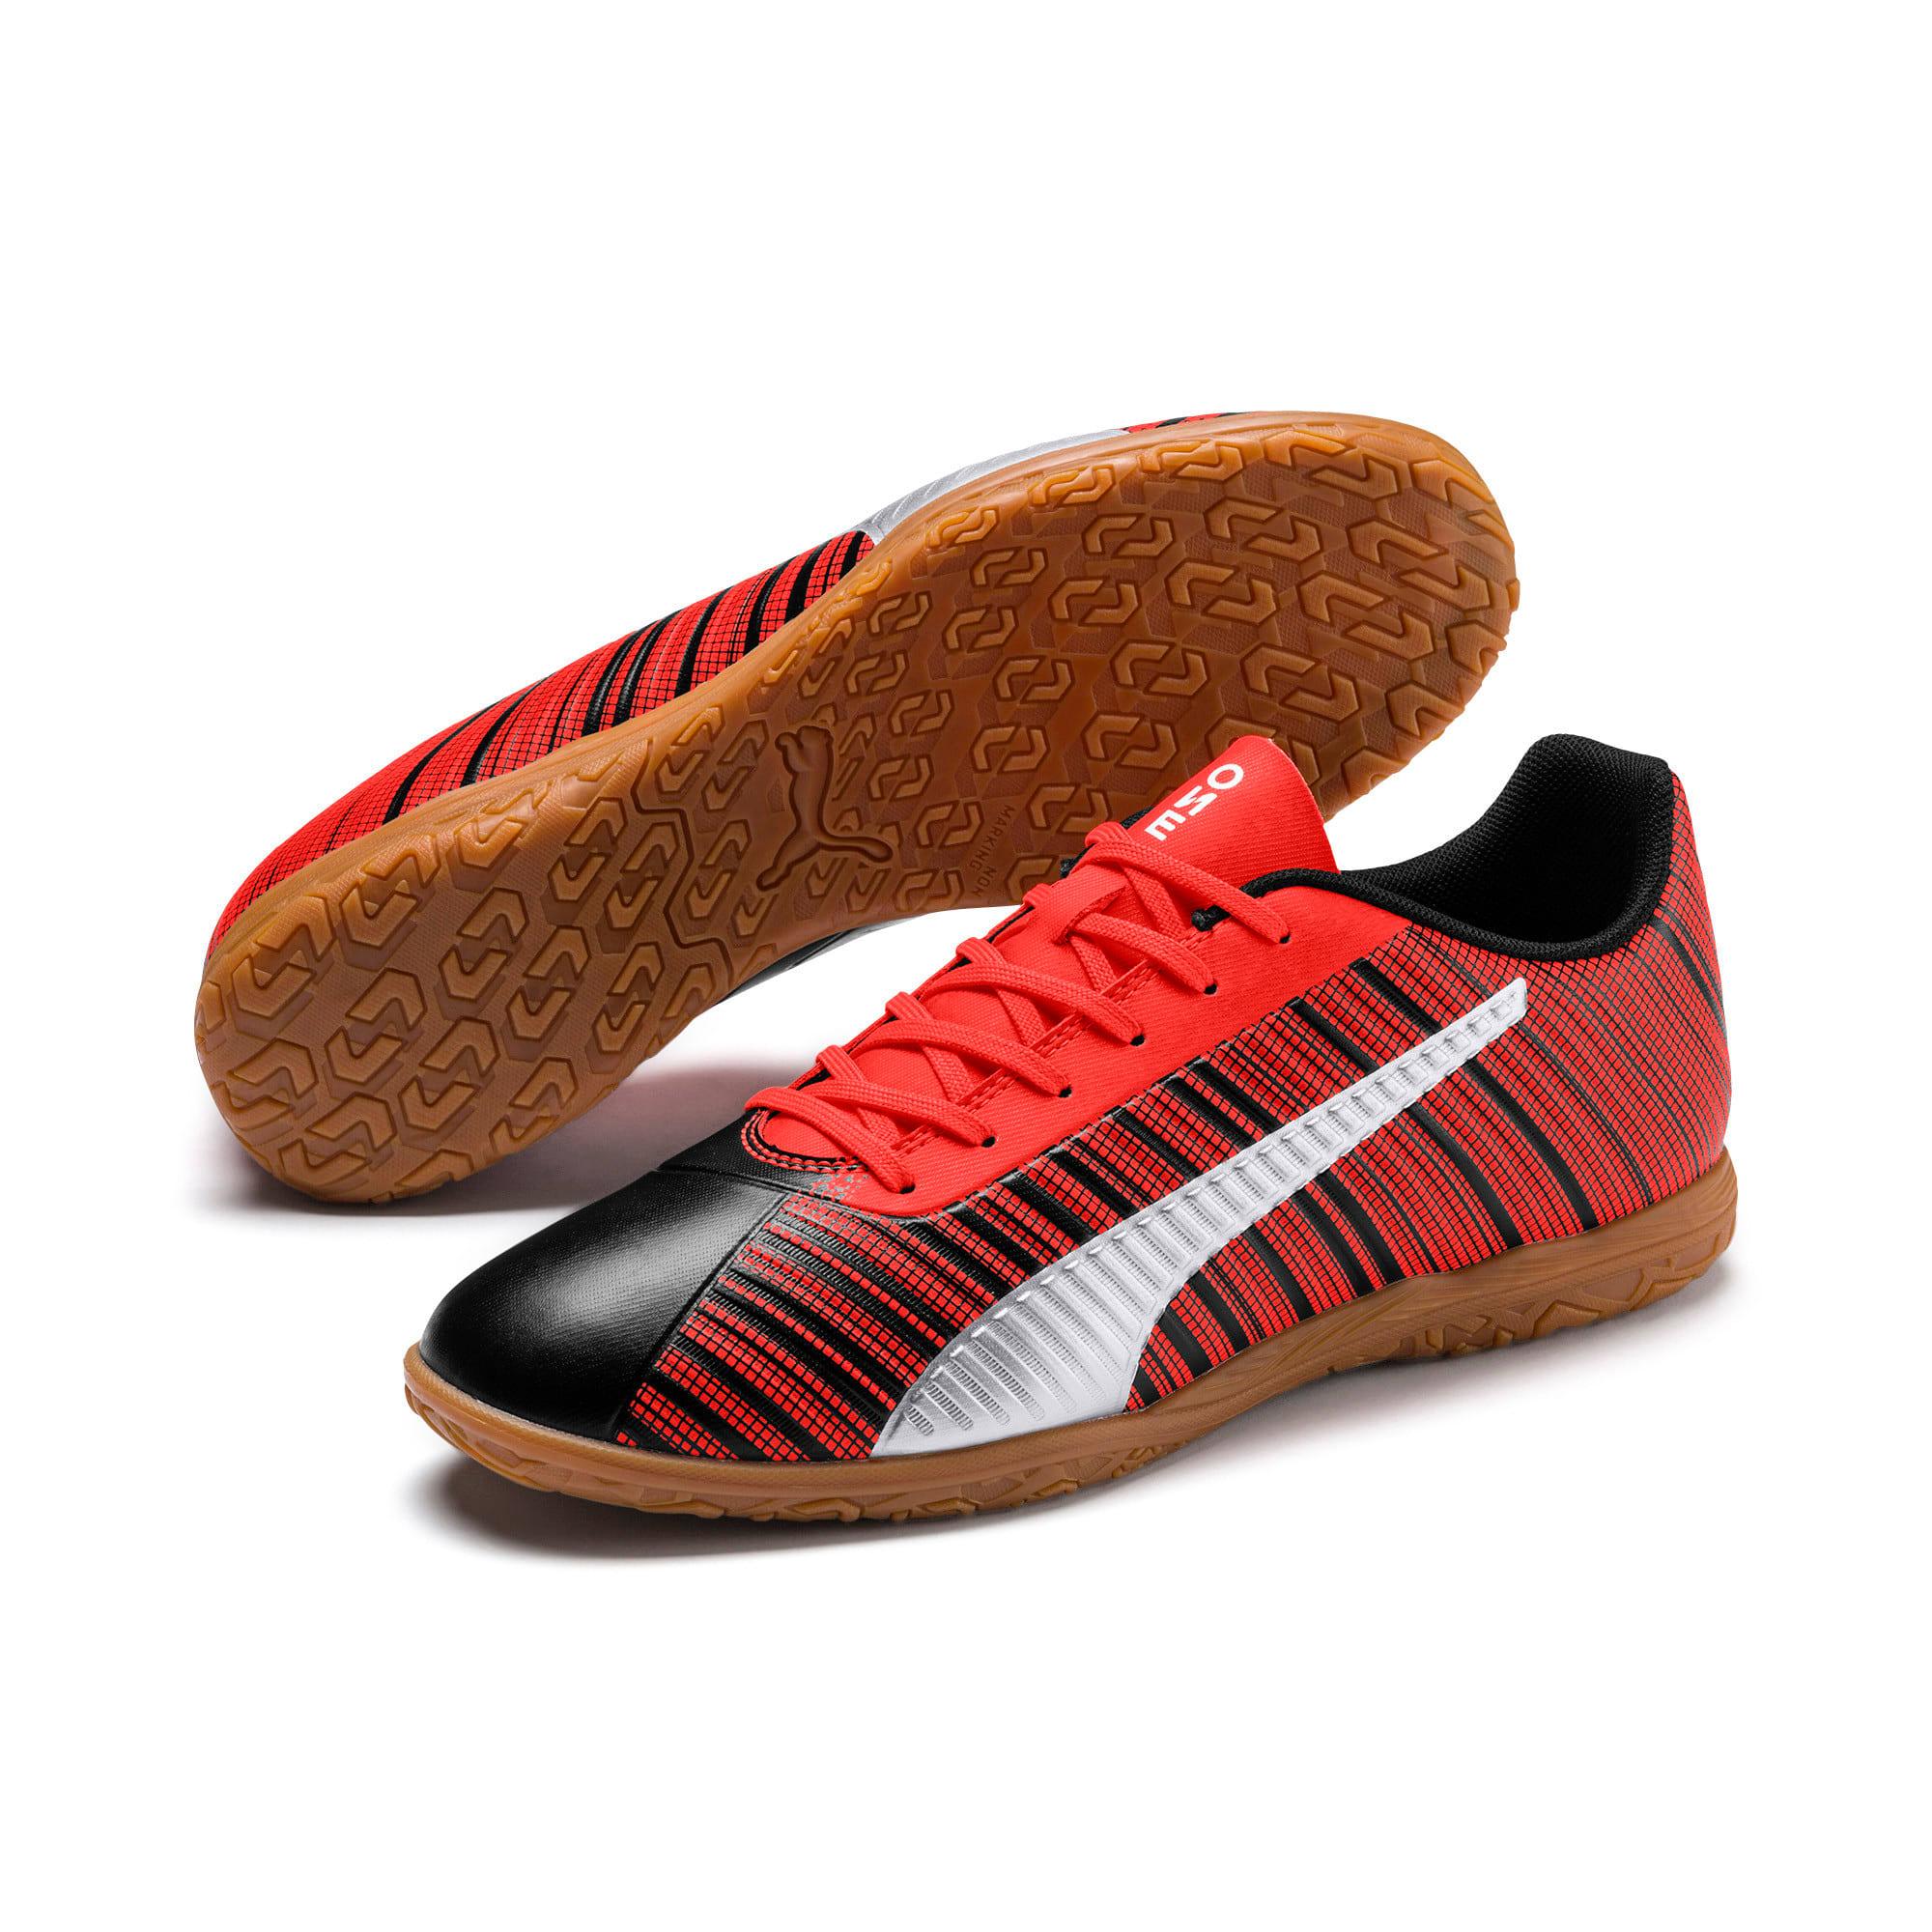 Thumbnail 2 of PUMA ONE 5.4 IT Men's Soccer Shoes, Black-Red-Silver-Gum, medium